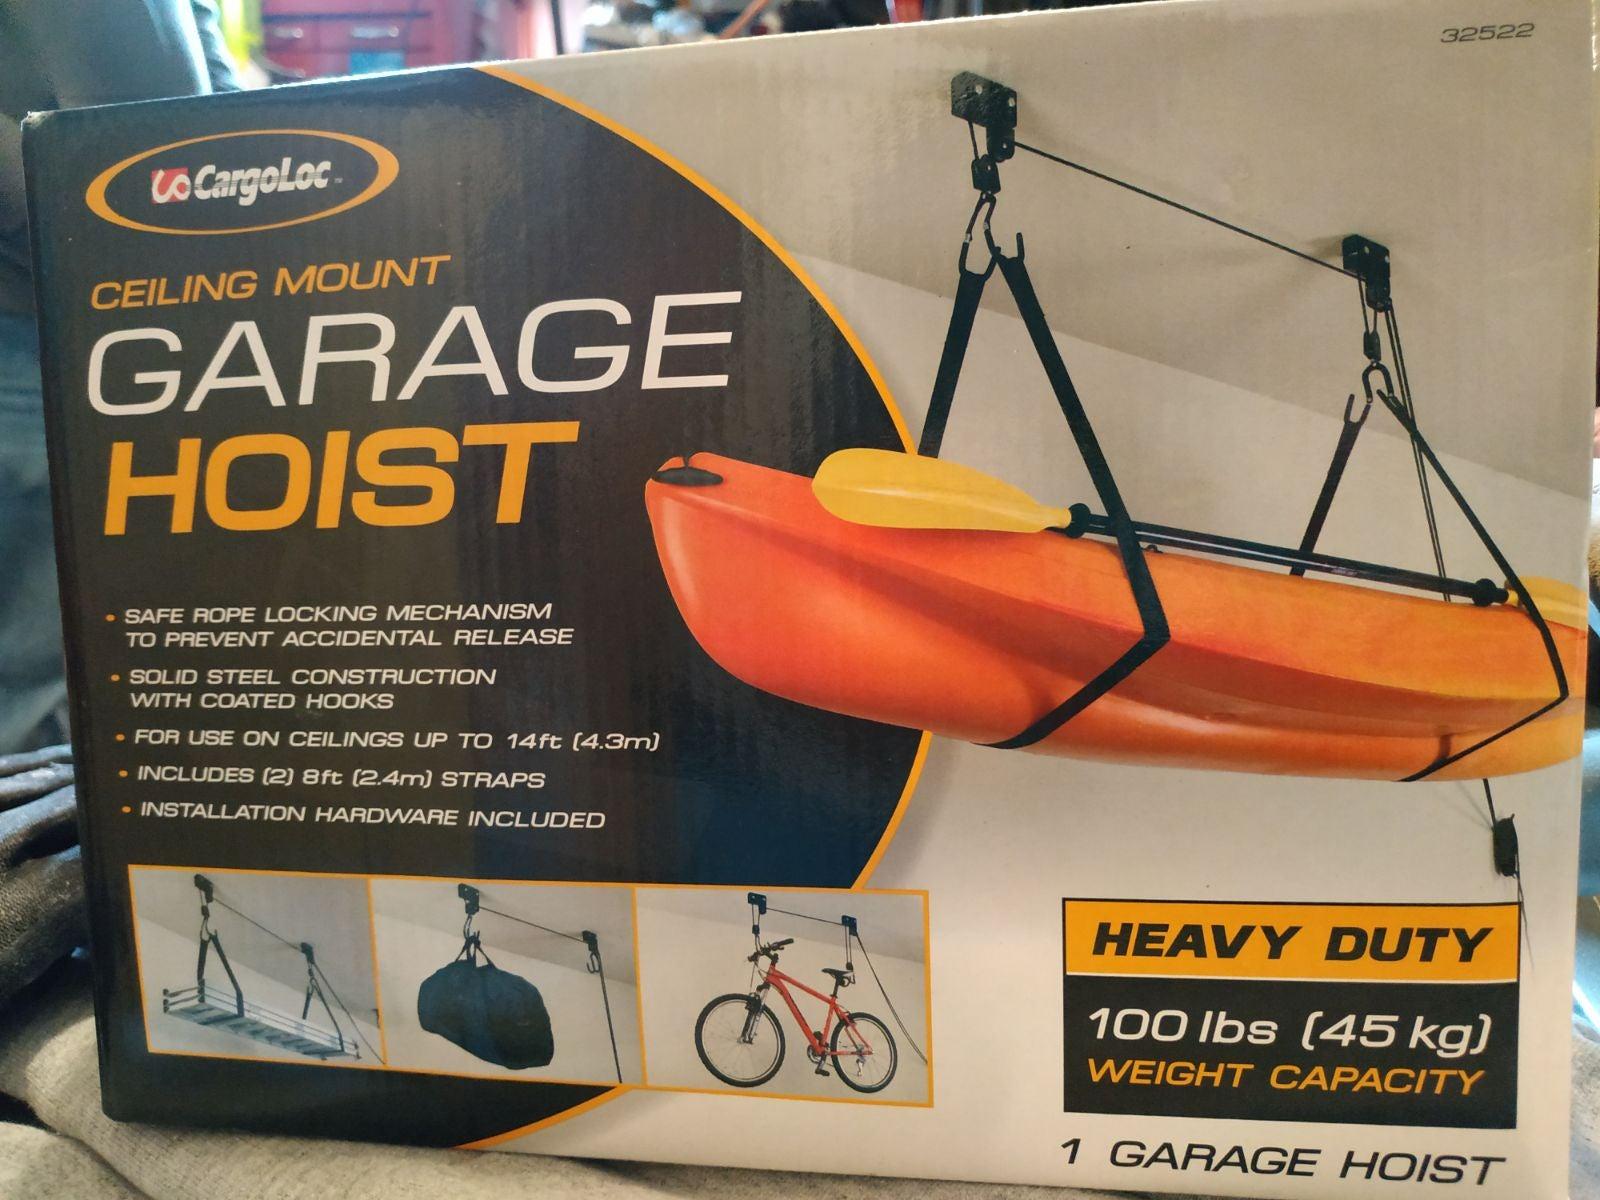 Ceiling mount garage hoist